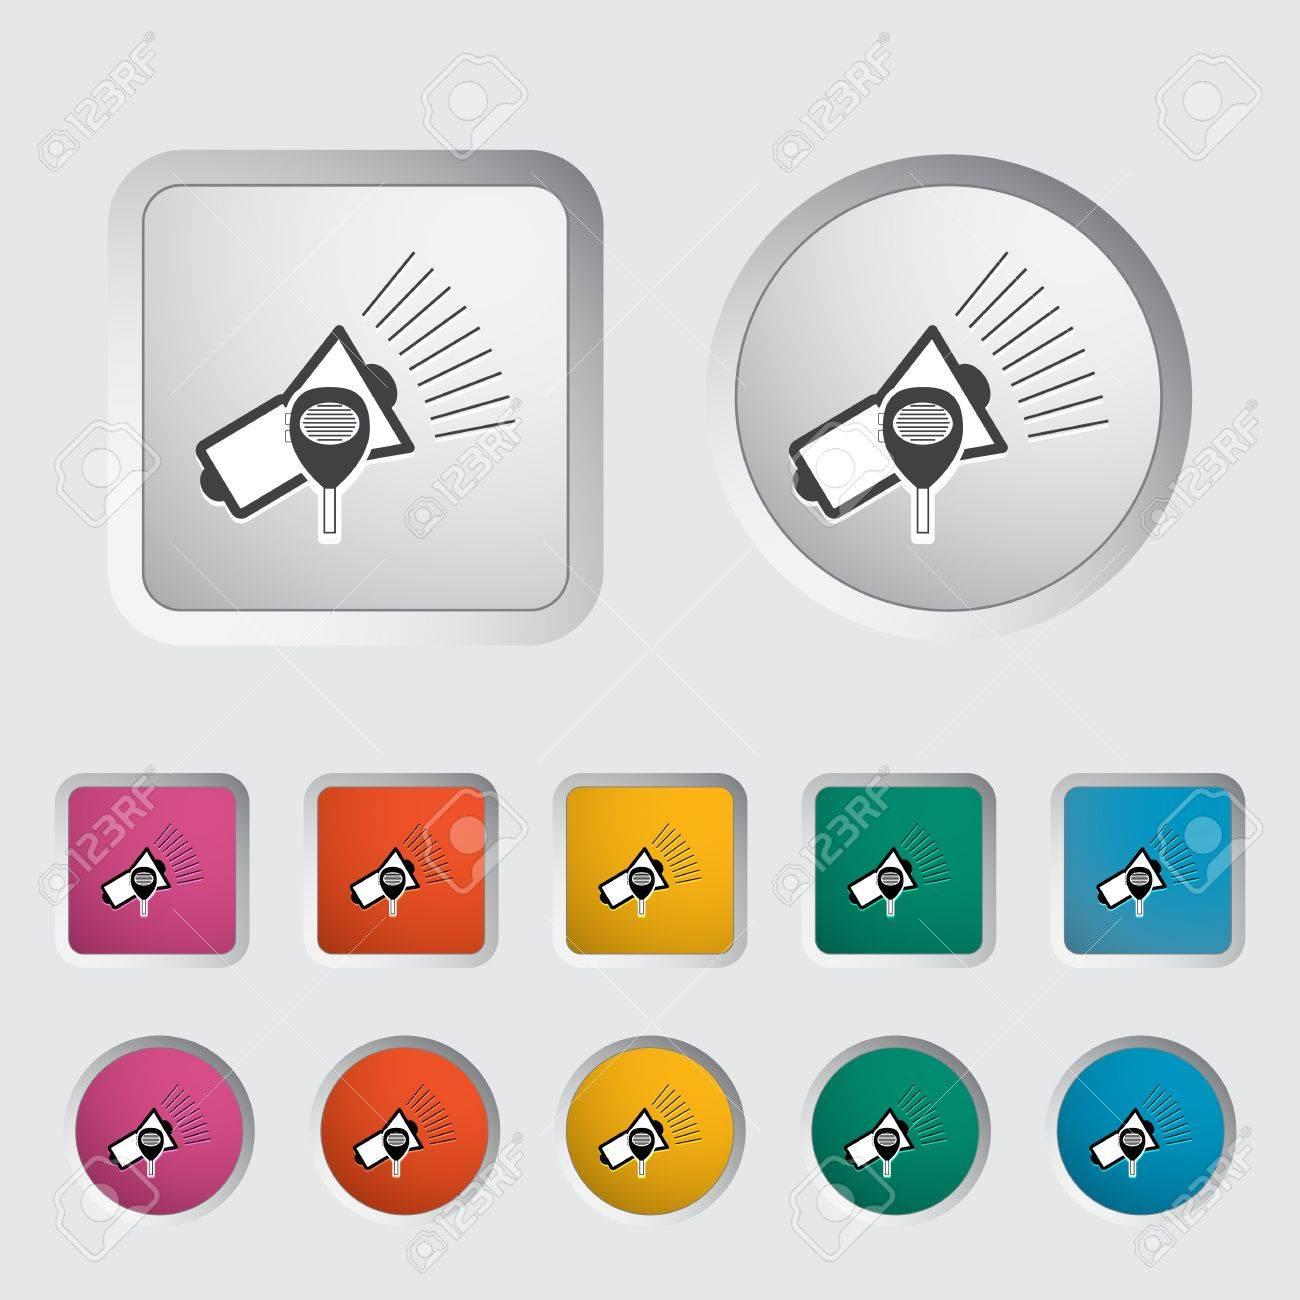 Megaphone single icon. Vector illustration. Stock Vector - 17355271